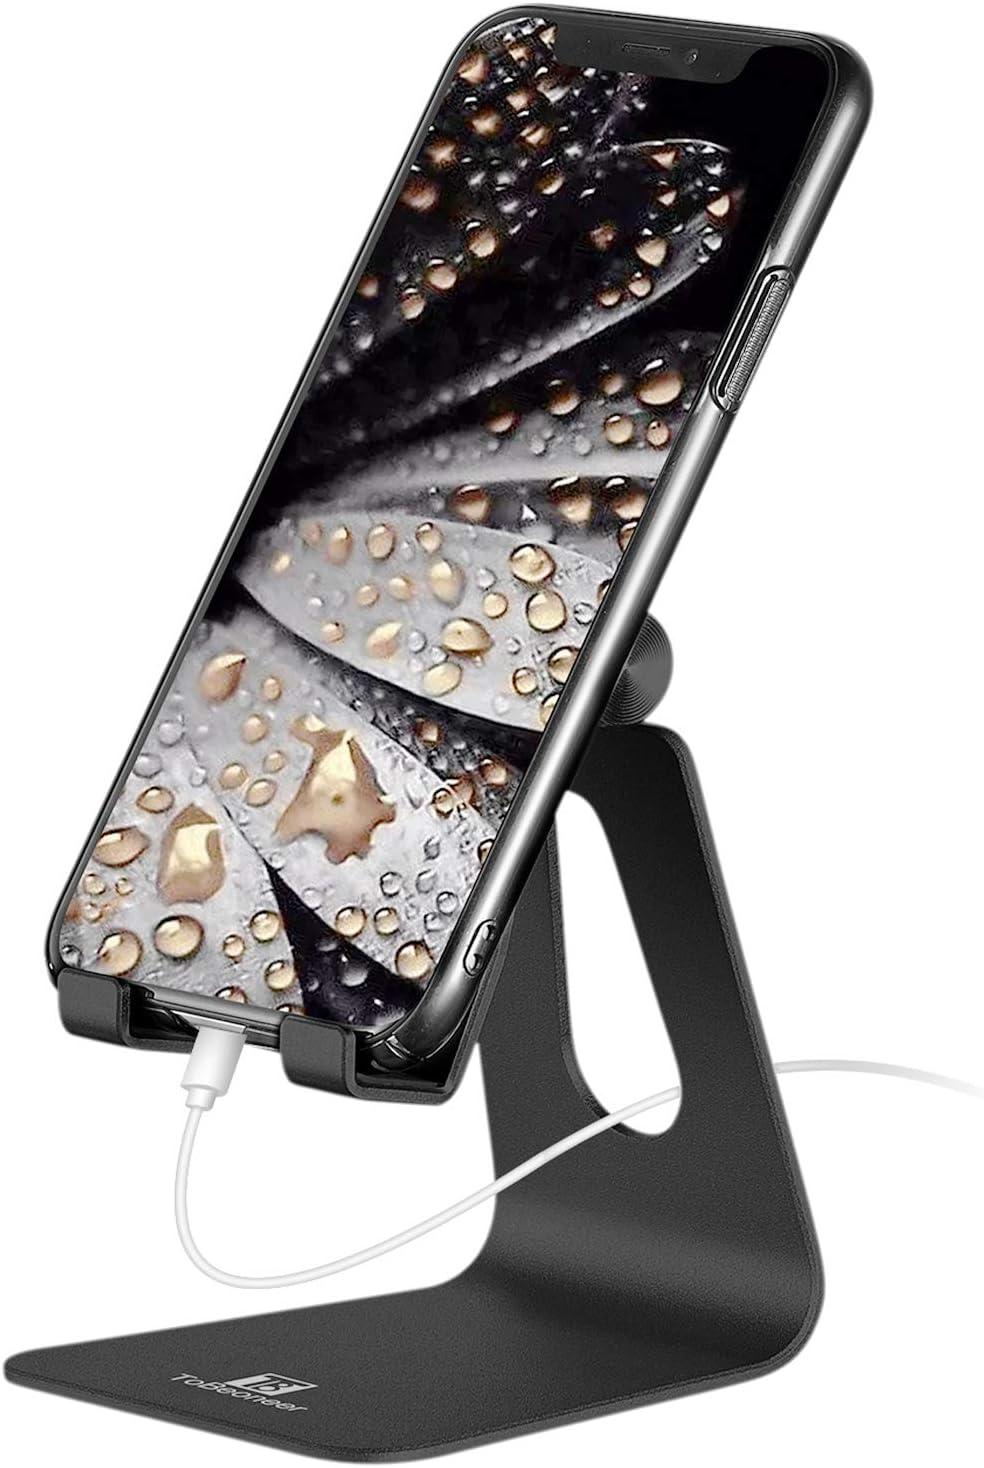 Adjustable Popular shop is the lowest price challenge Industry No. 1 Cell Phone Stand - Desktop Al ToBeoneer Holder